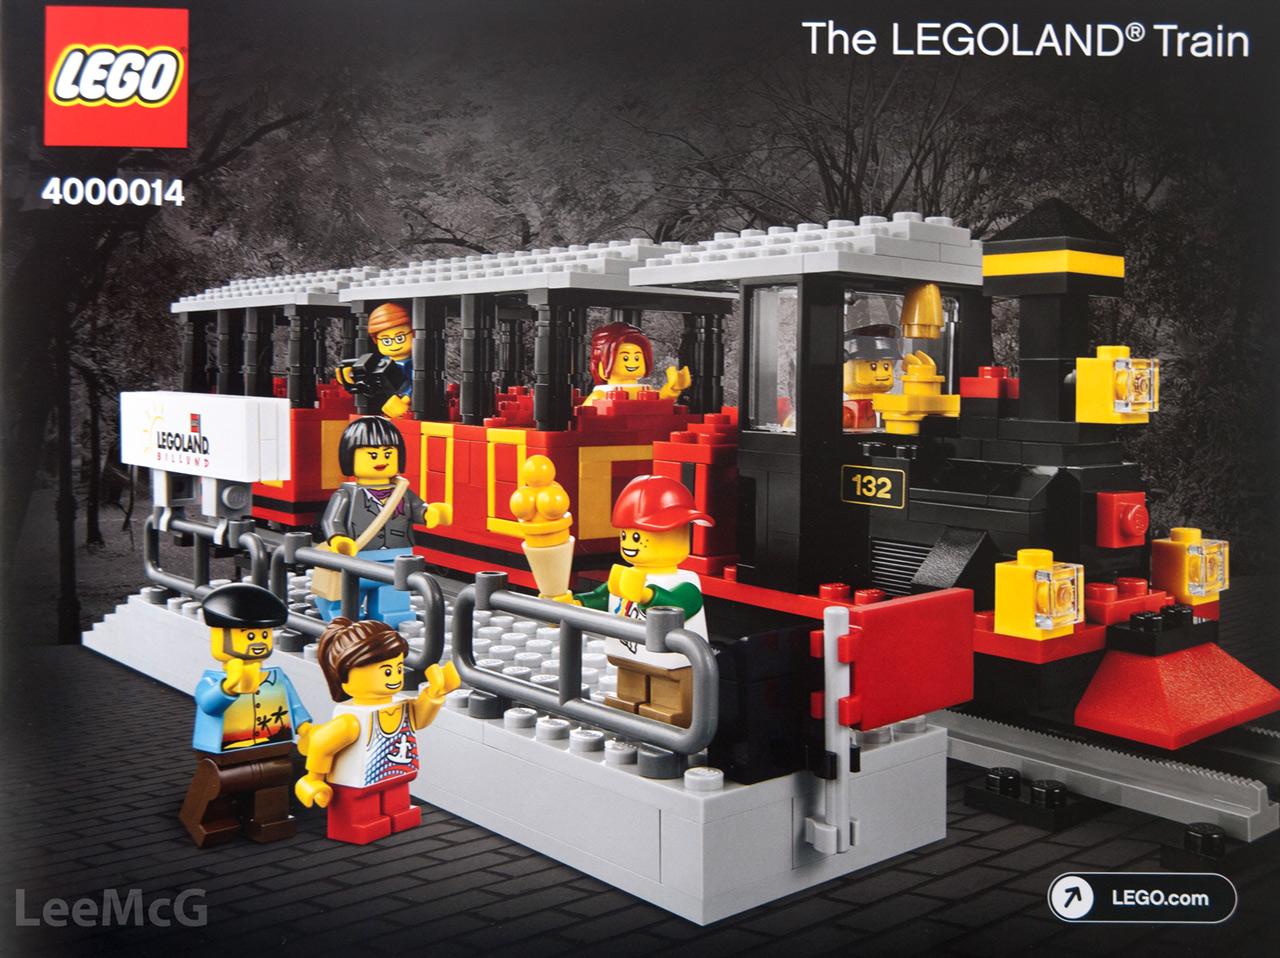 2014 Inside Tour set: Legoland Train | New Elementary, a LEGO ...